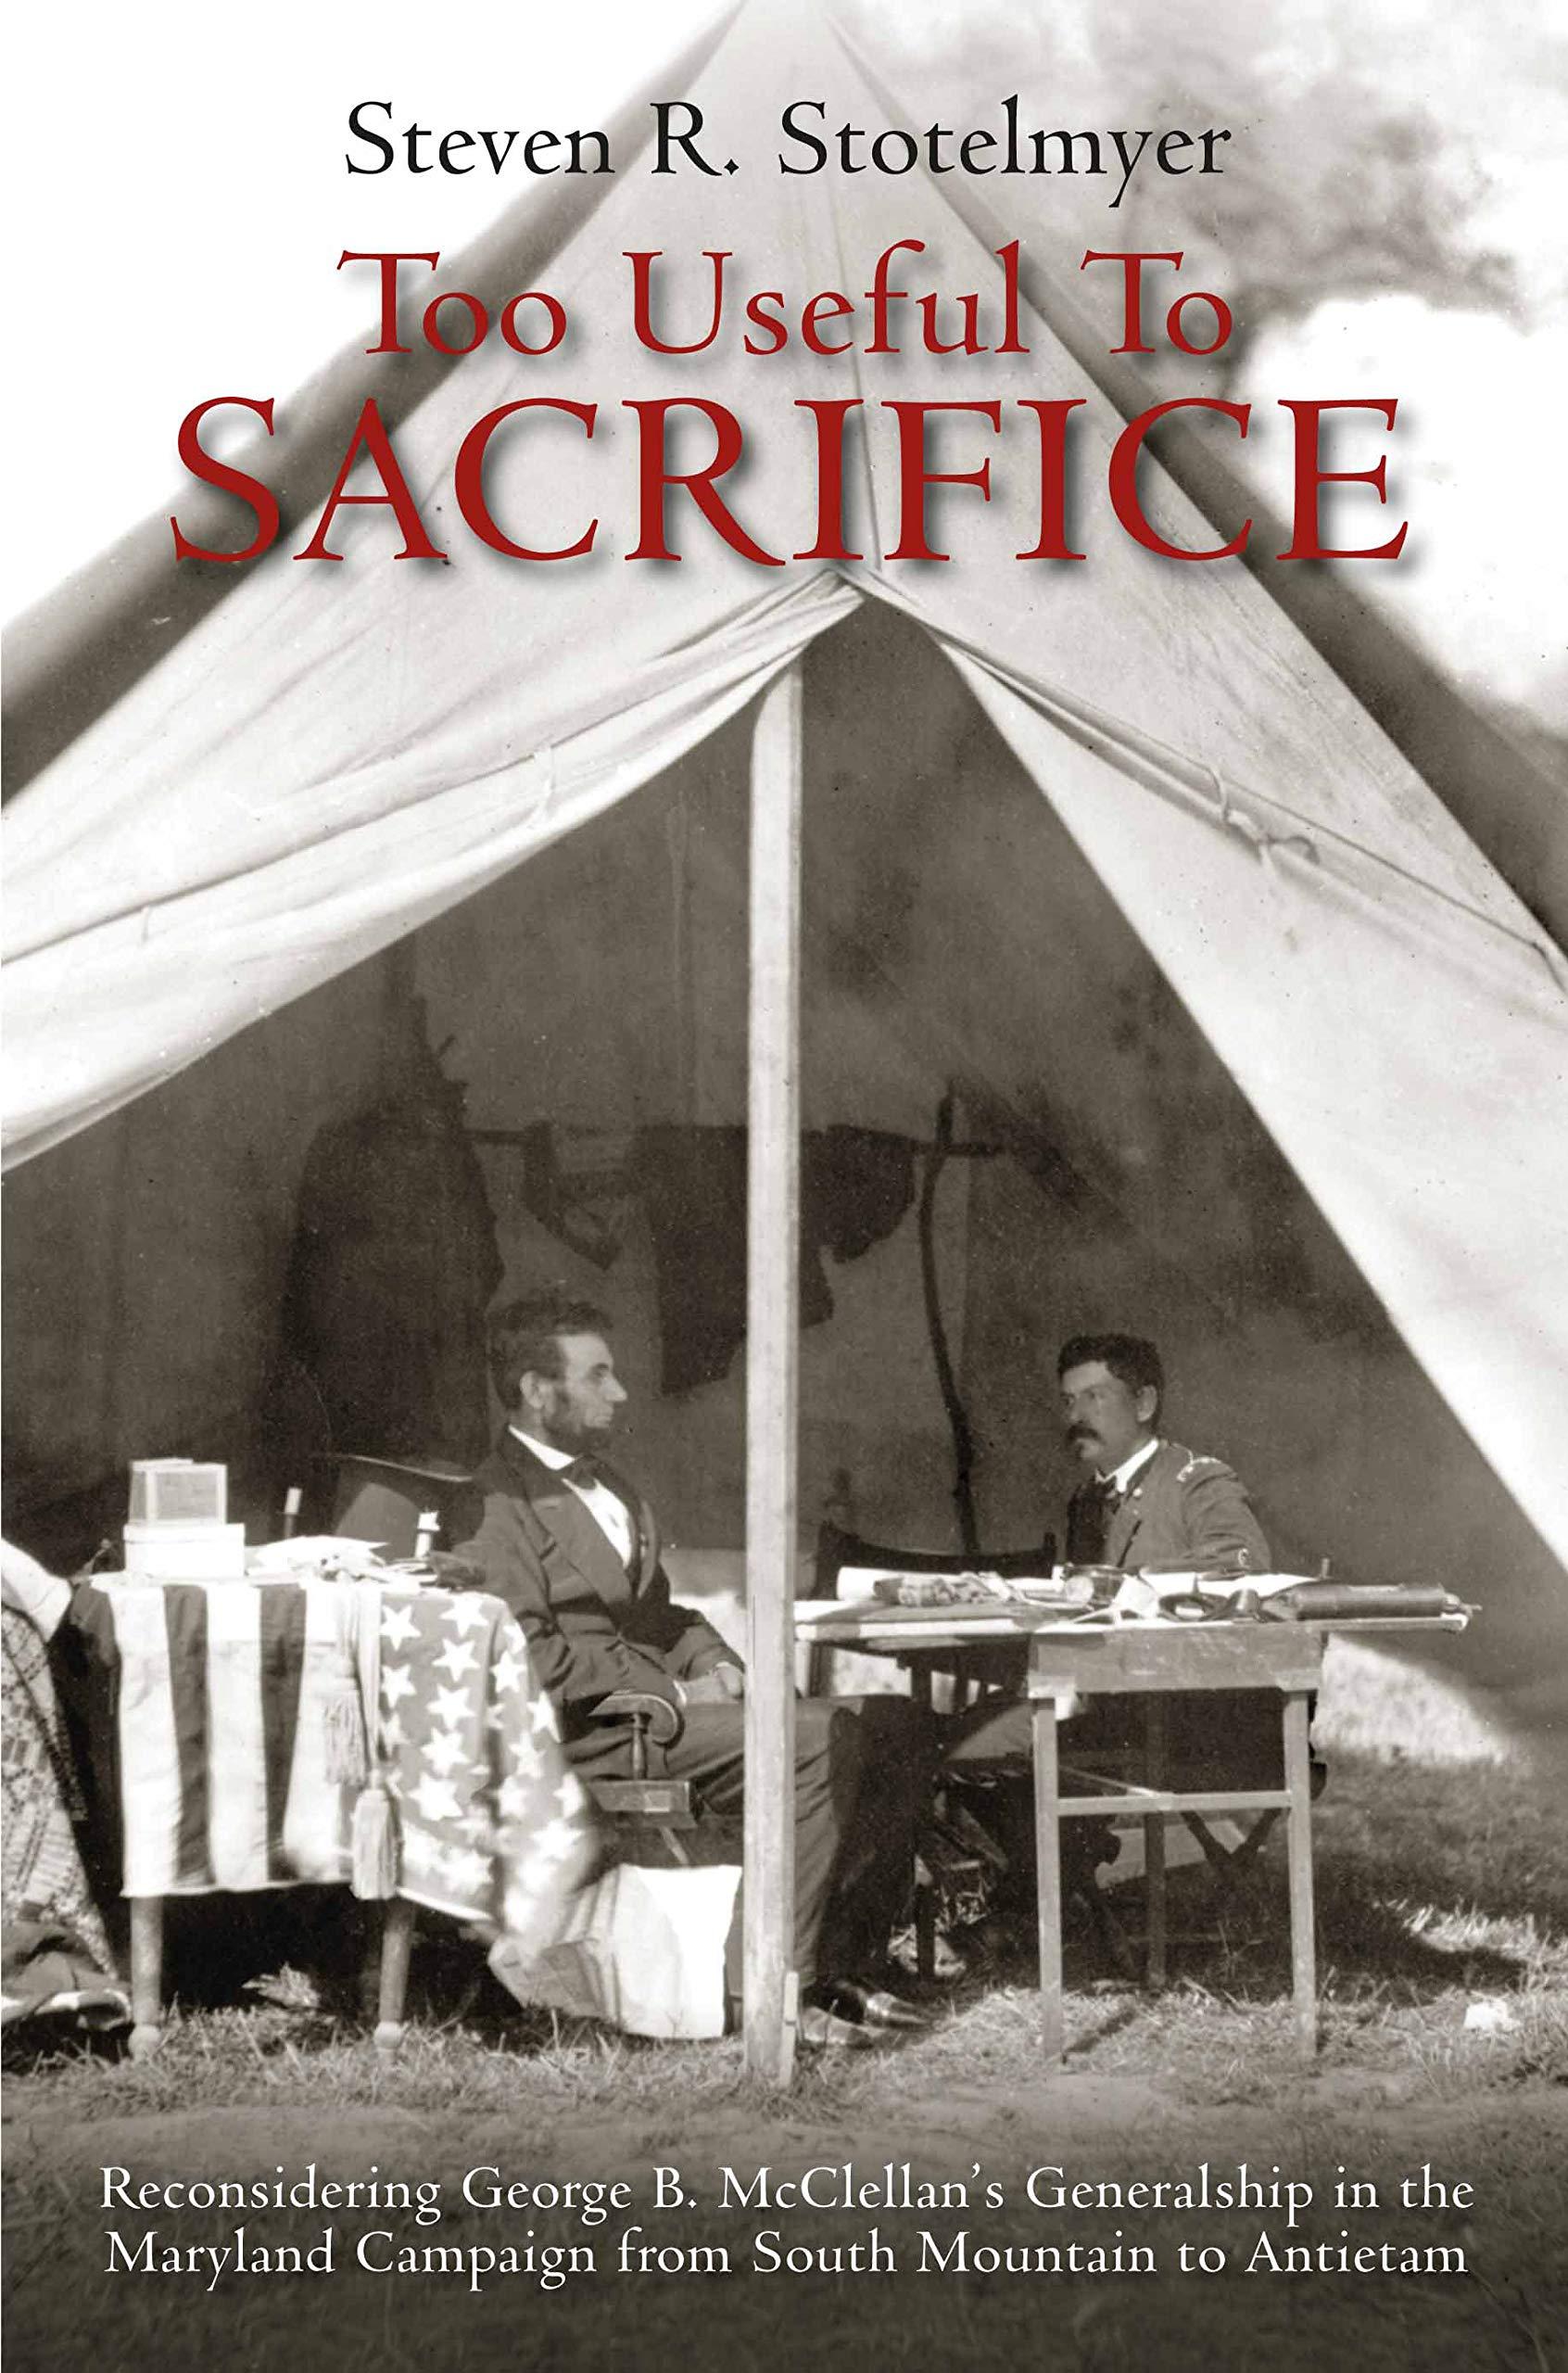 Too Useful to Sacrifice: Reconsidering George